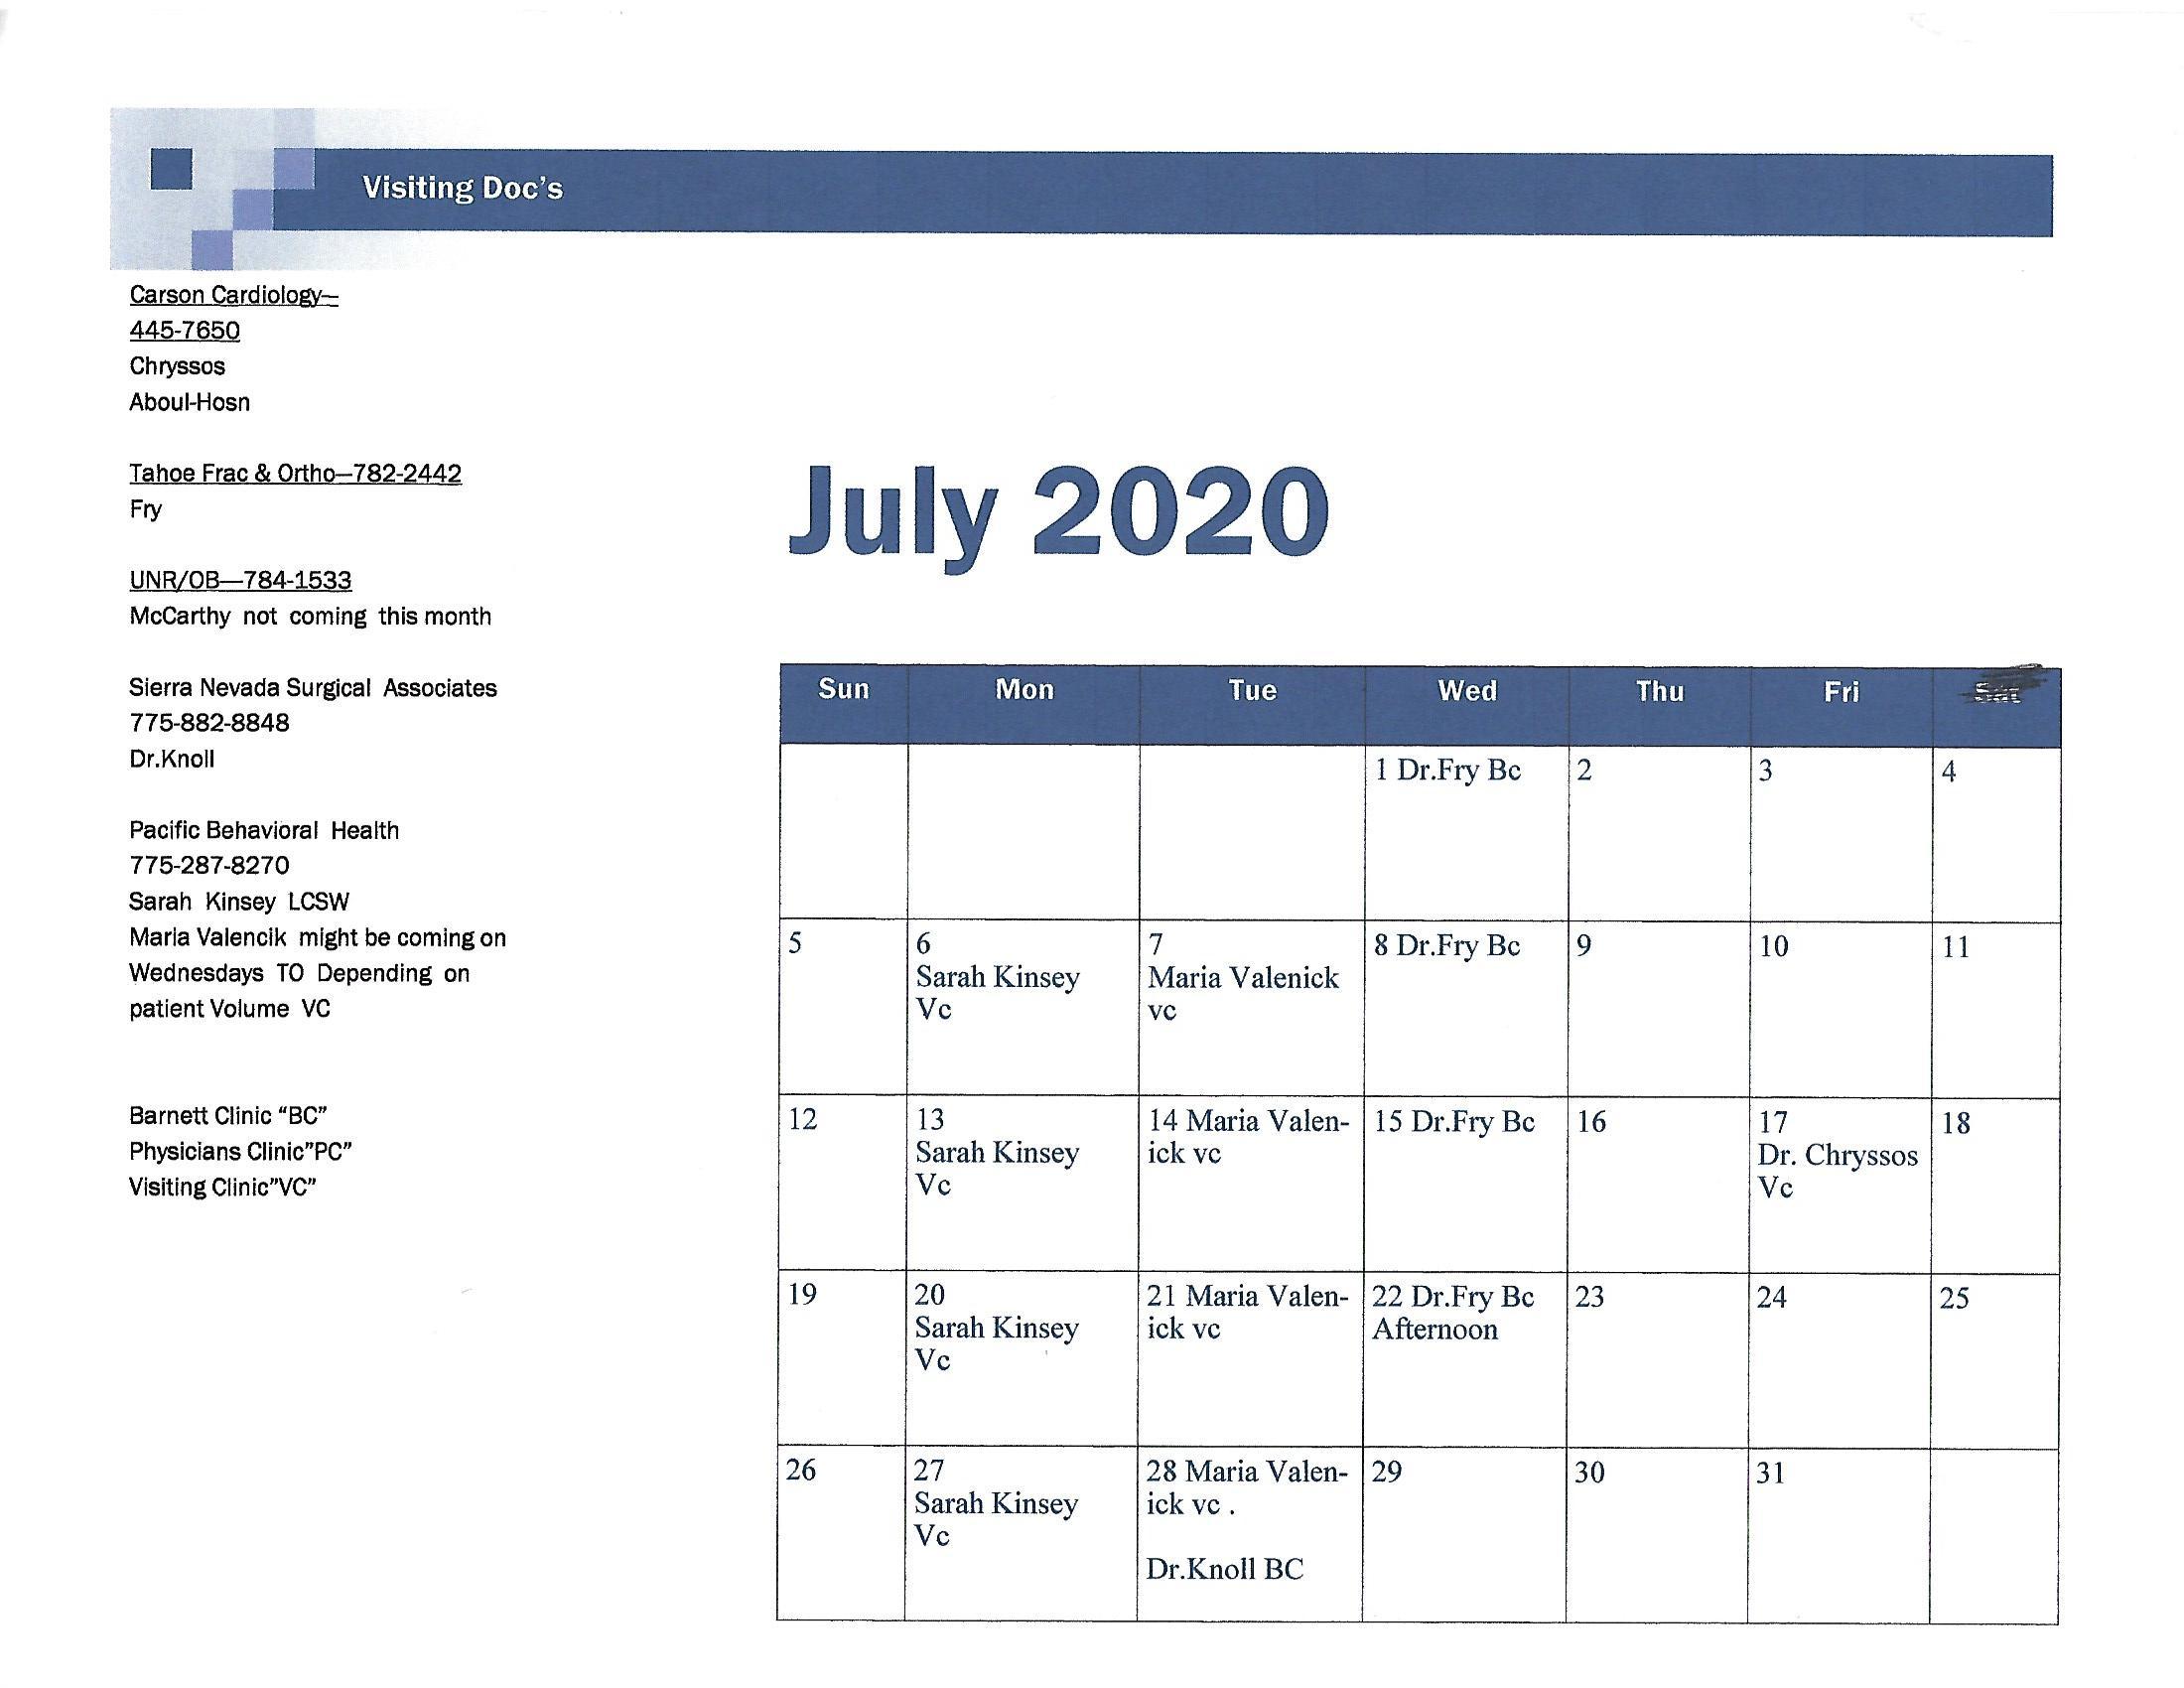 July 2020 visiting doc